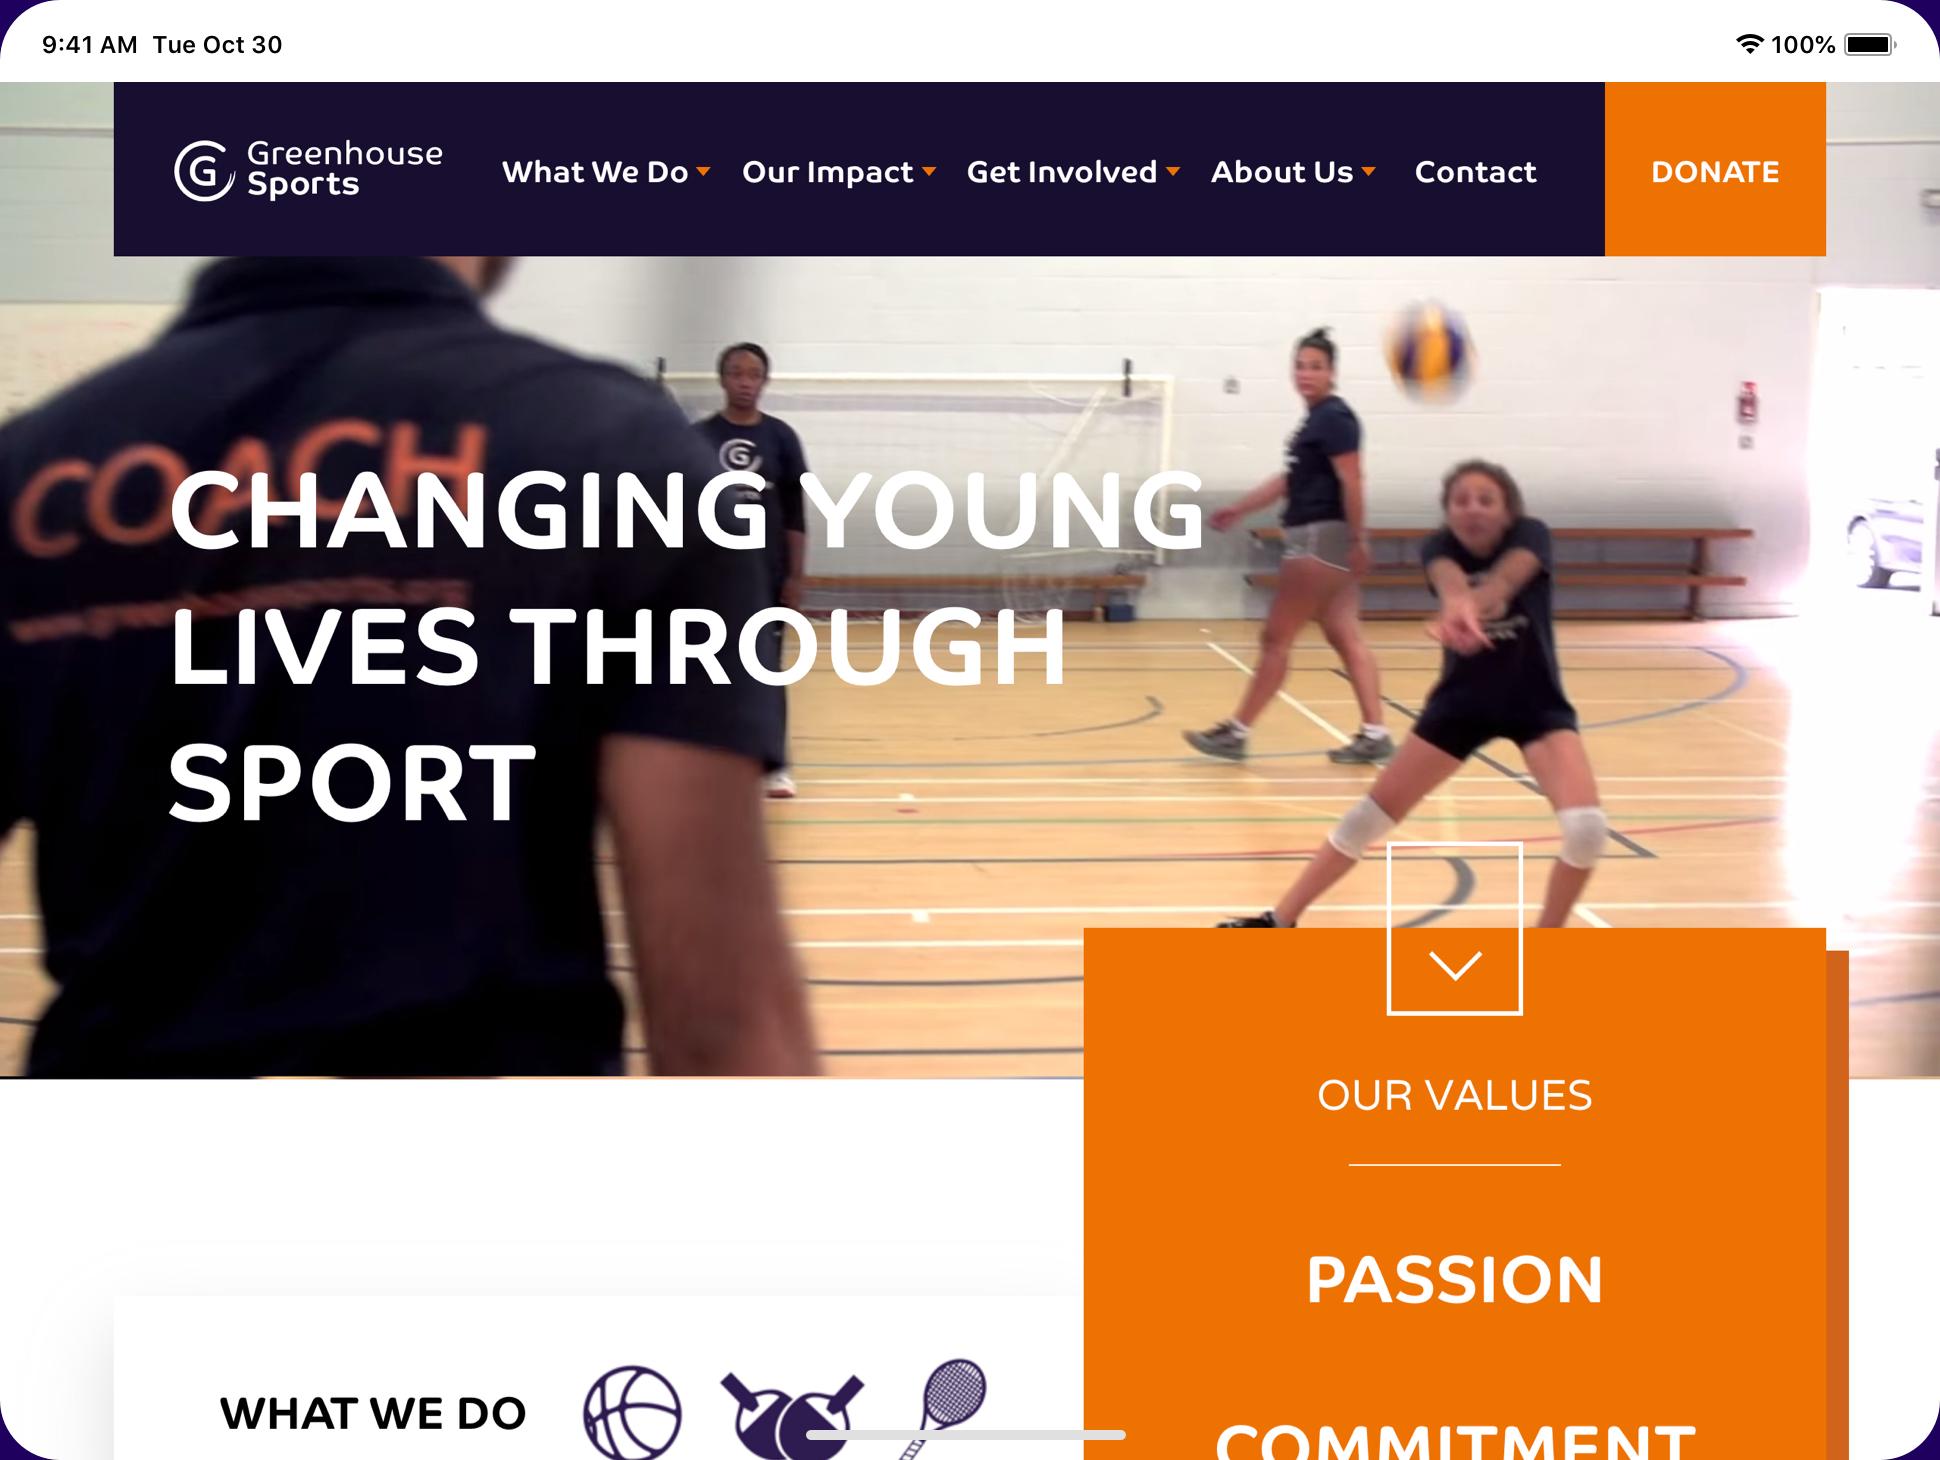 Greenhouse sports website screenshot